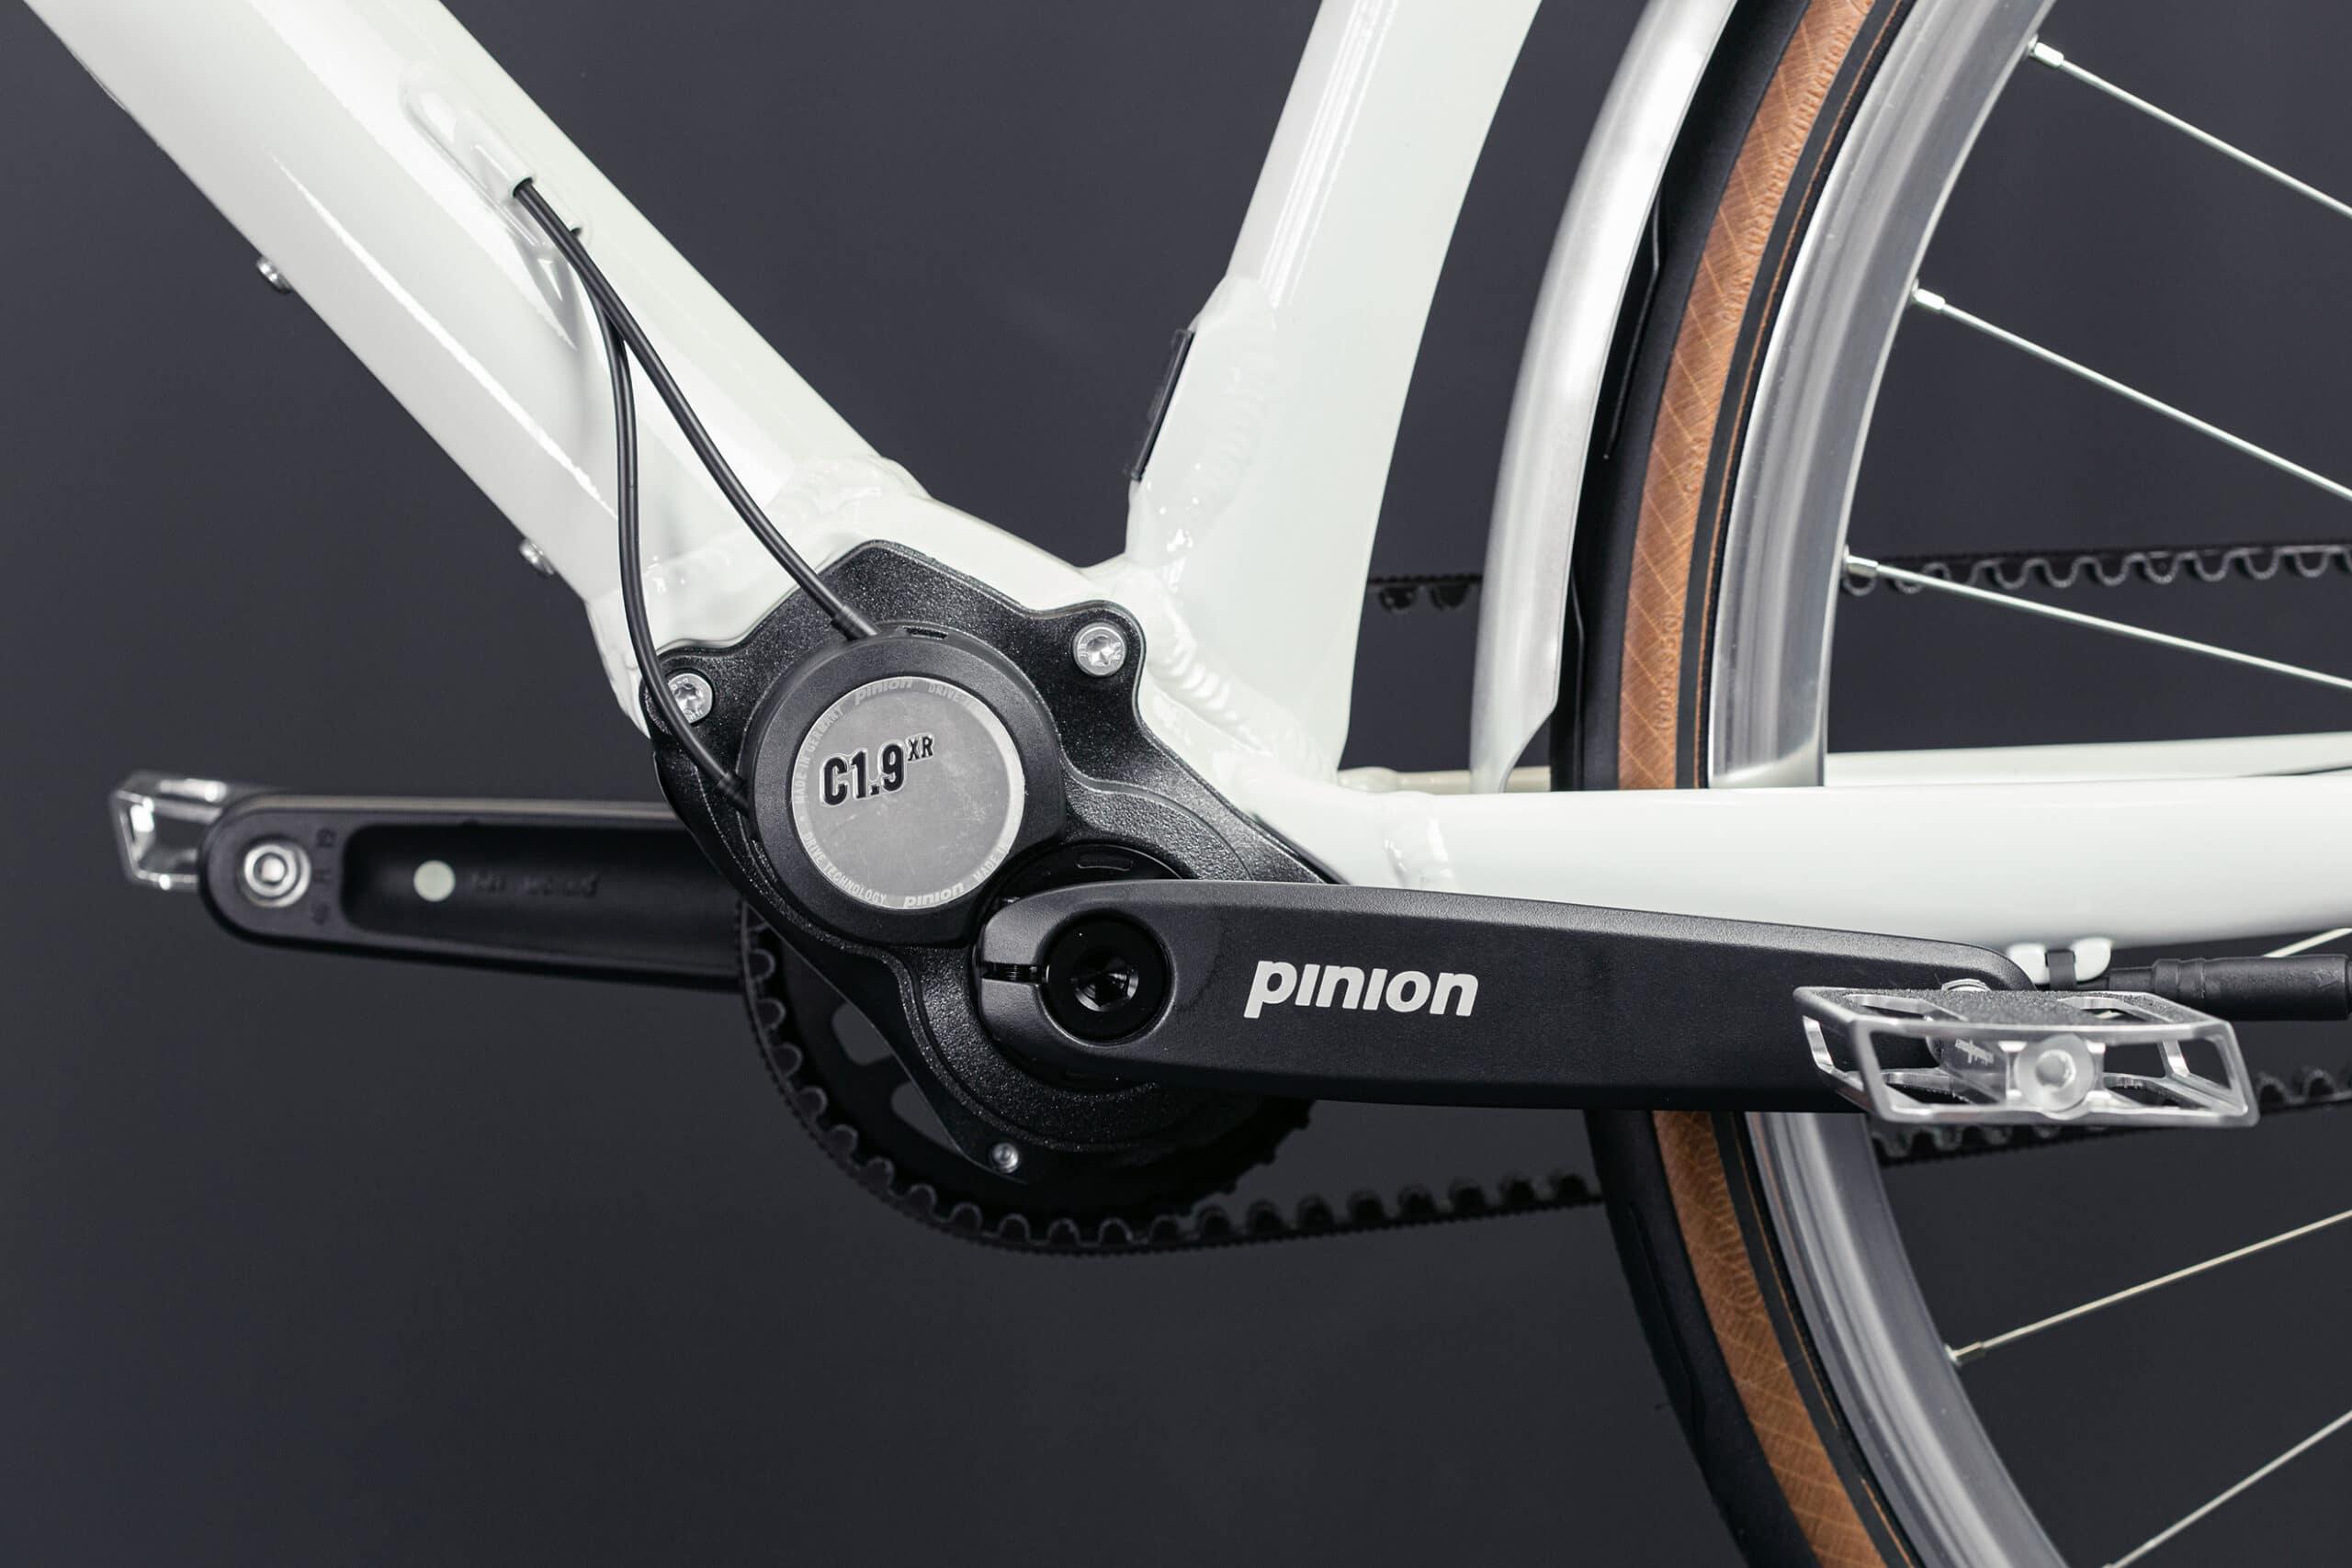 schindelhauer Antonia Pinion e-bike -8